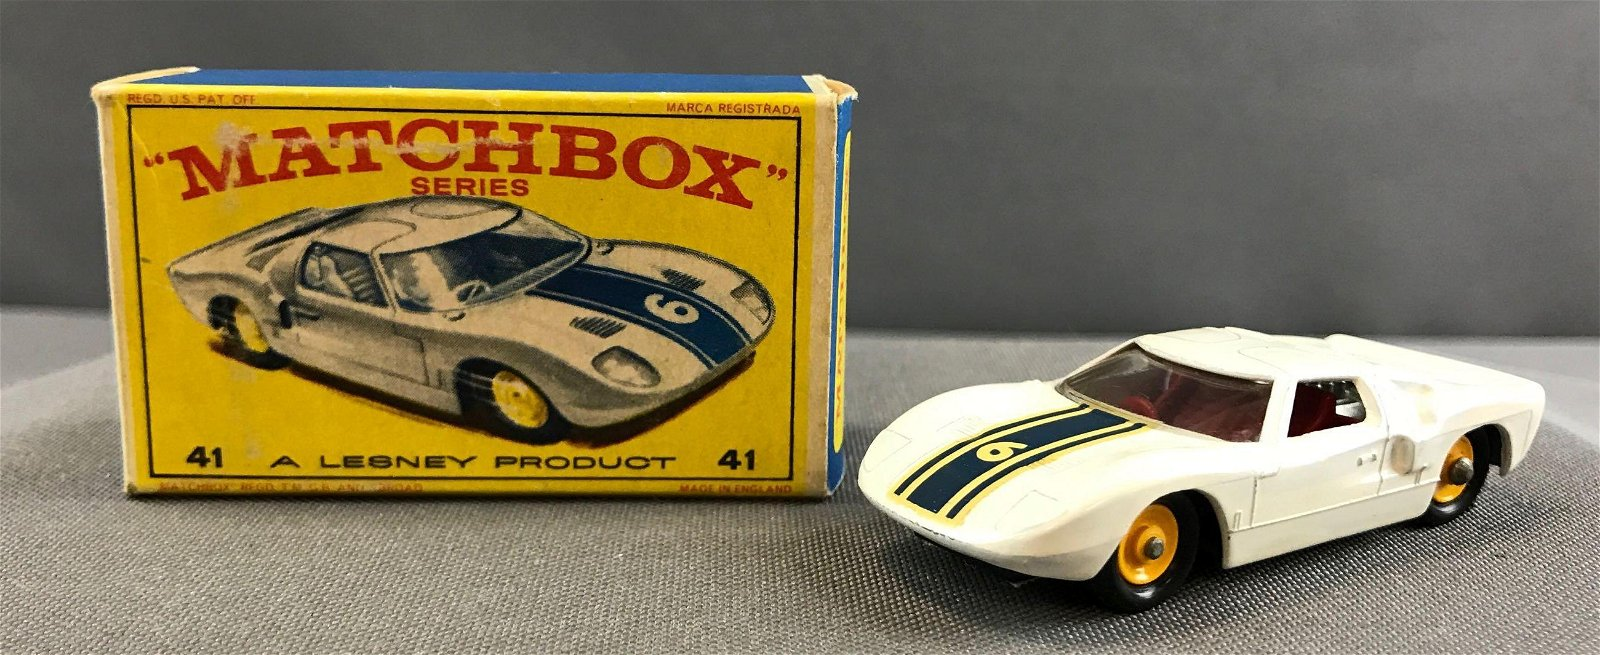 Matchbox No. 41 Ford G.T. die cast vehicle